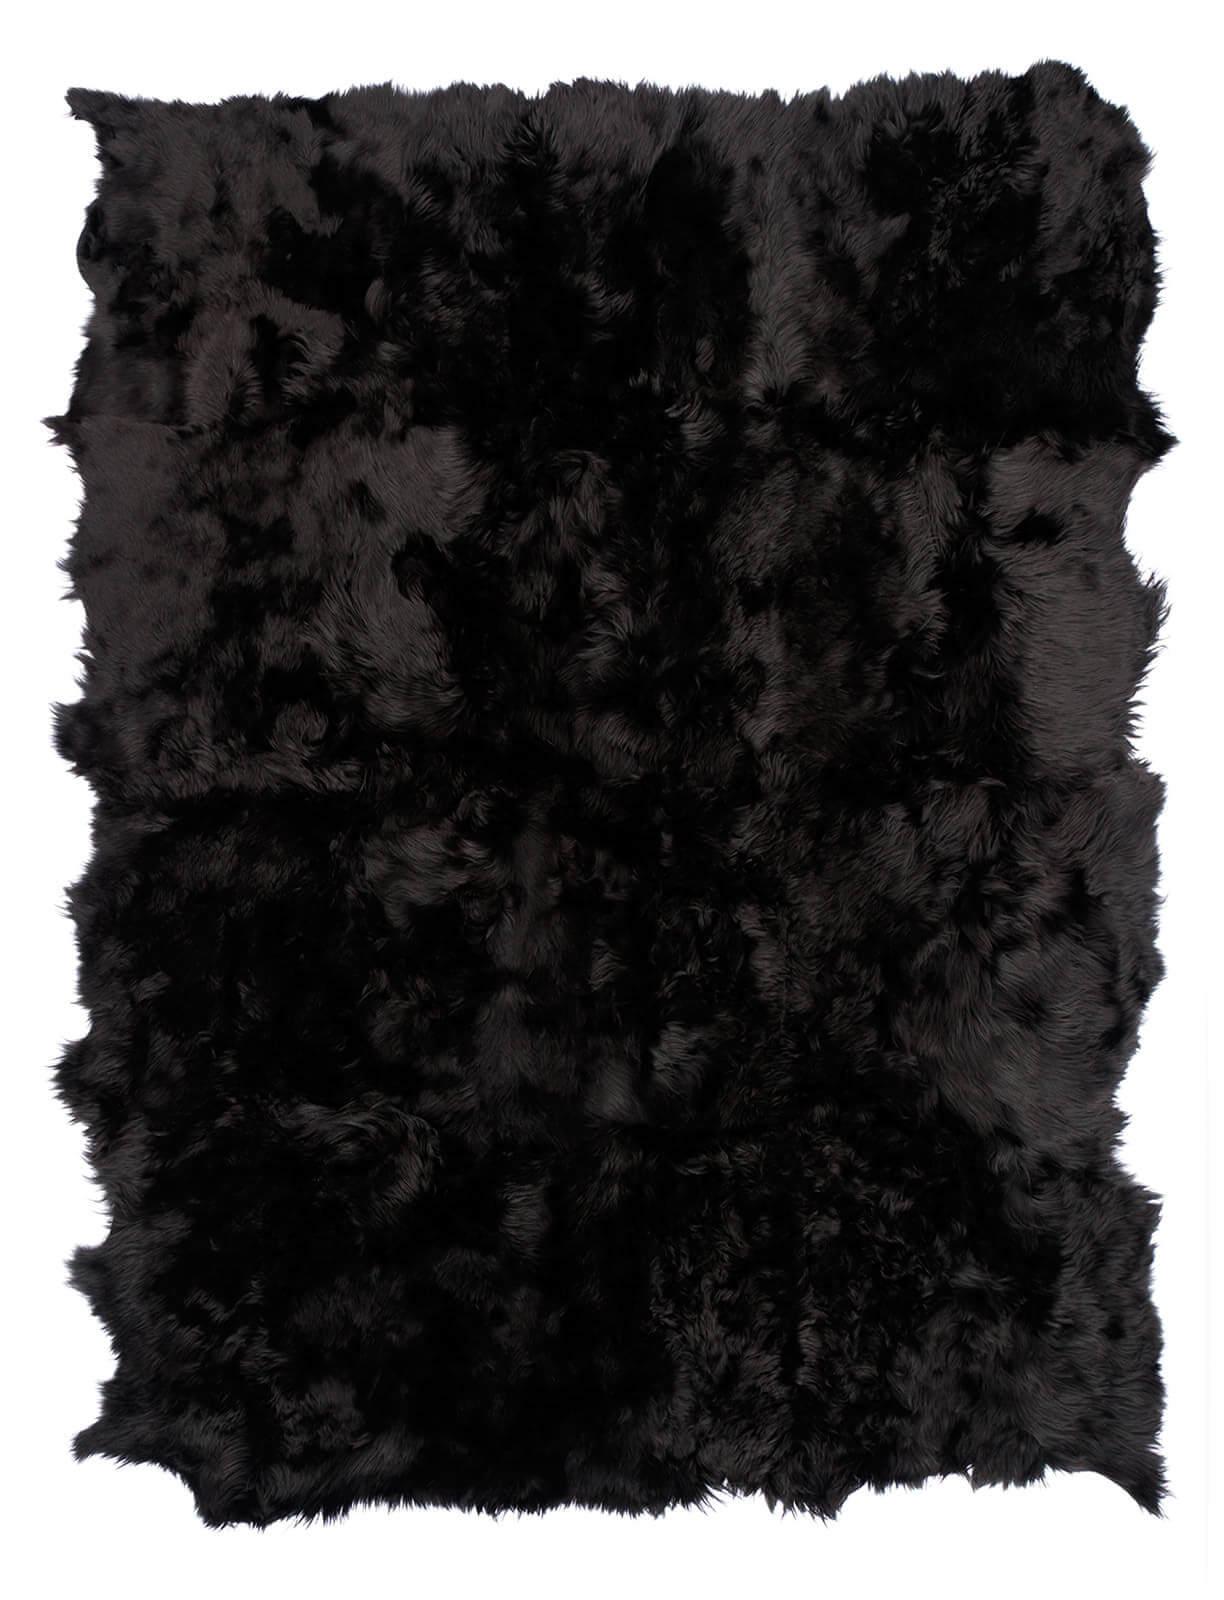 PHANTOM ORGANIC  shown in Black